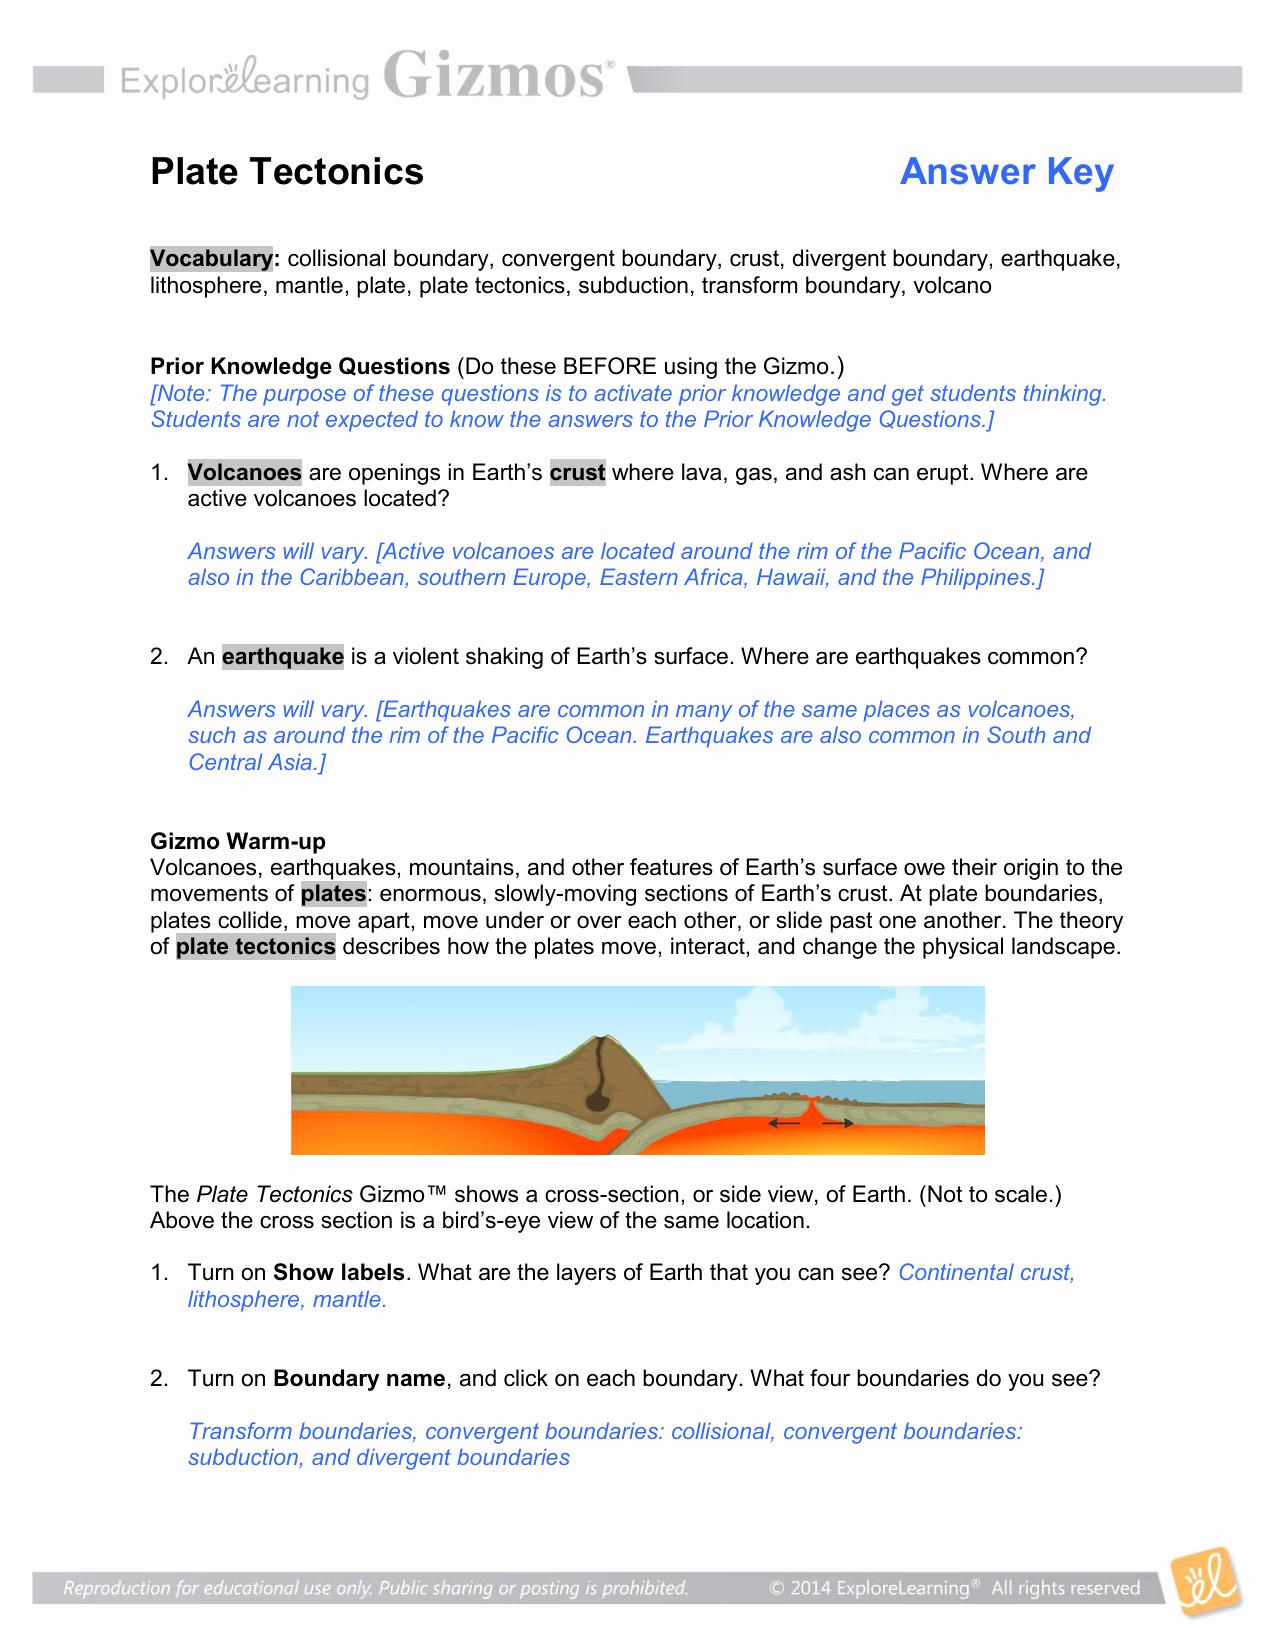 Plate Tectonic Worksheet Answers Fresh Plate Tectonics